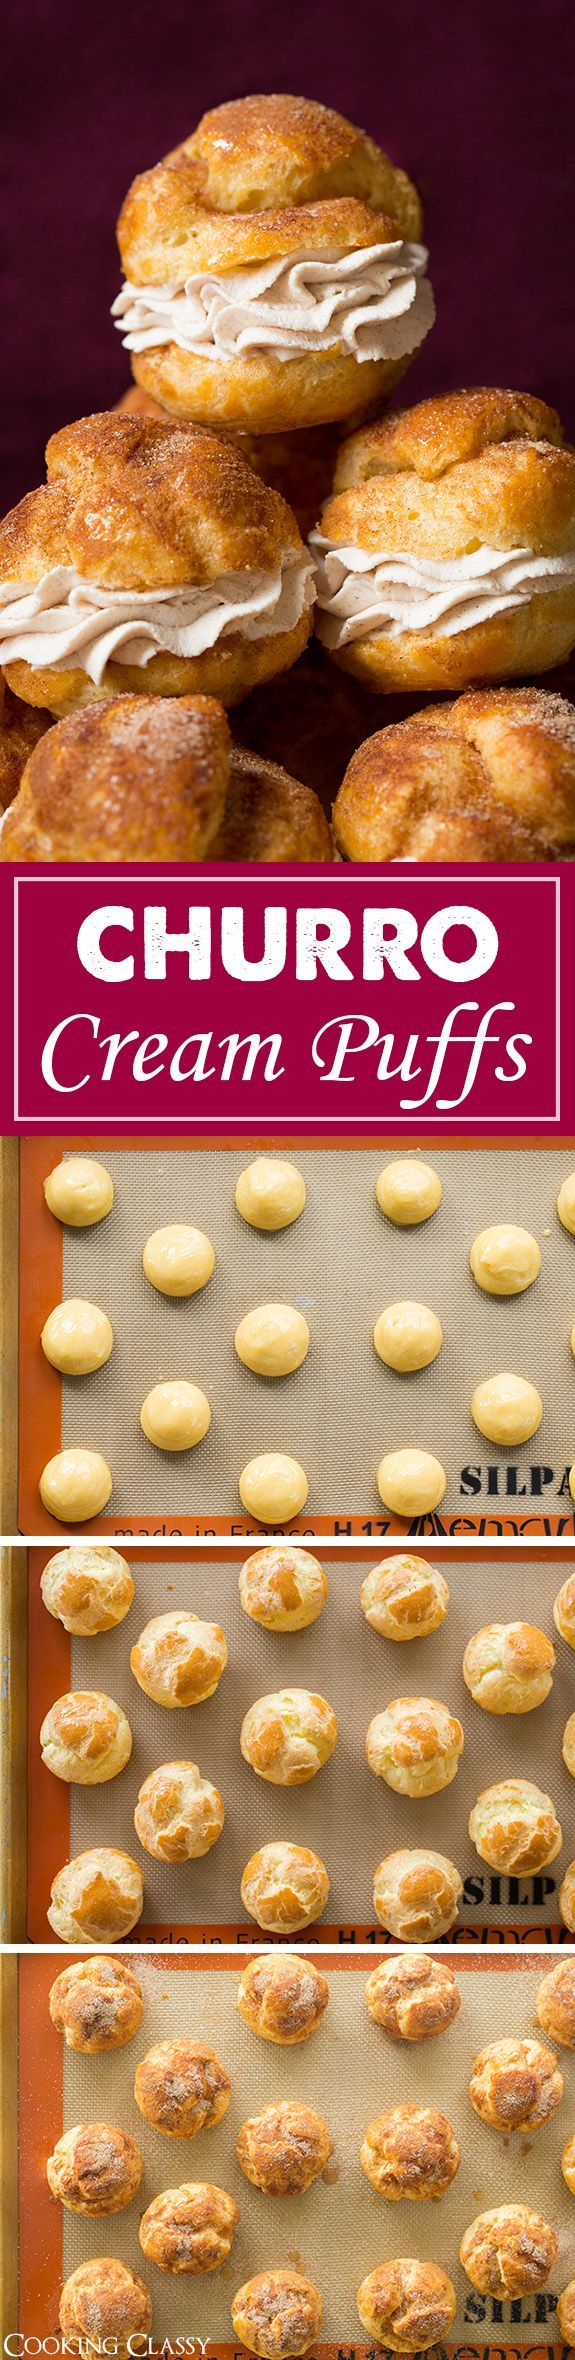 Great Churro Cream Puffs - Cooking Classy, ,